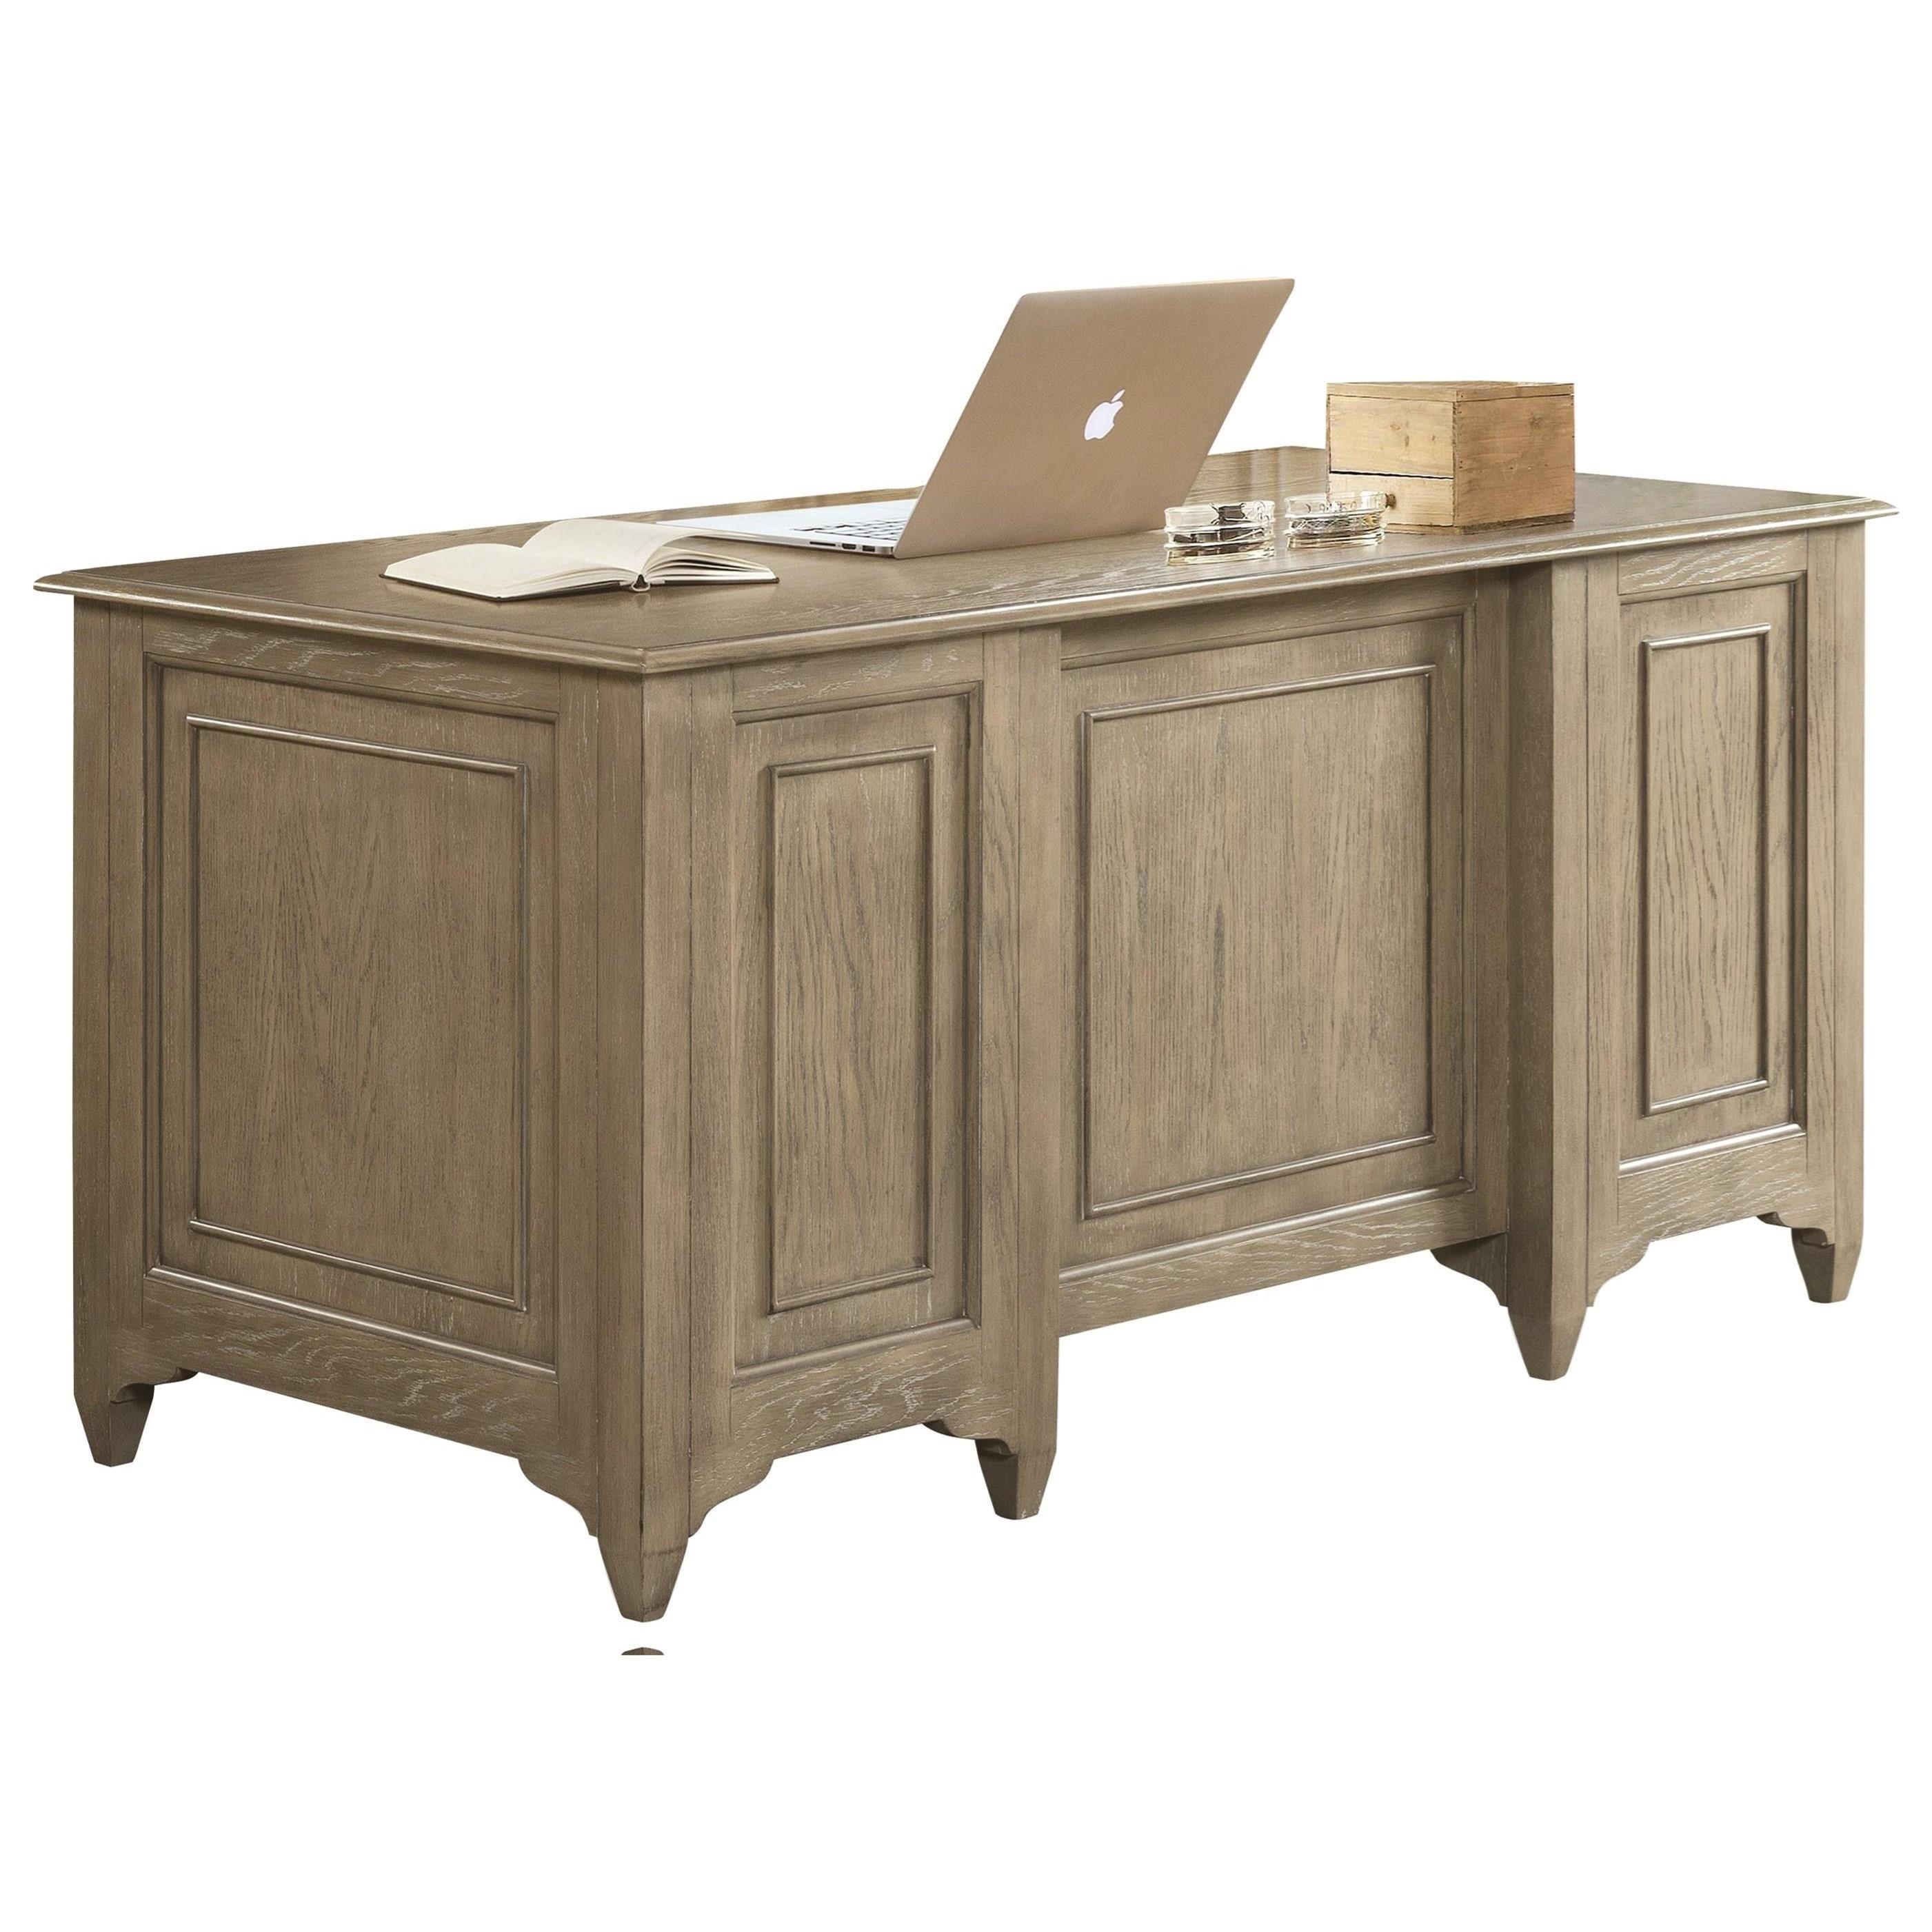 Riverside Furniture Myra 59420 Executive Desk With File Drawers Hudson S Furniture Double Pedestal Desks